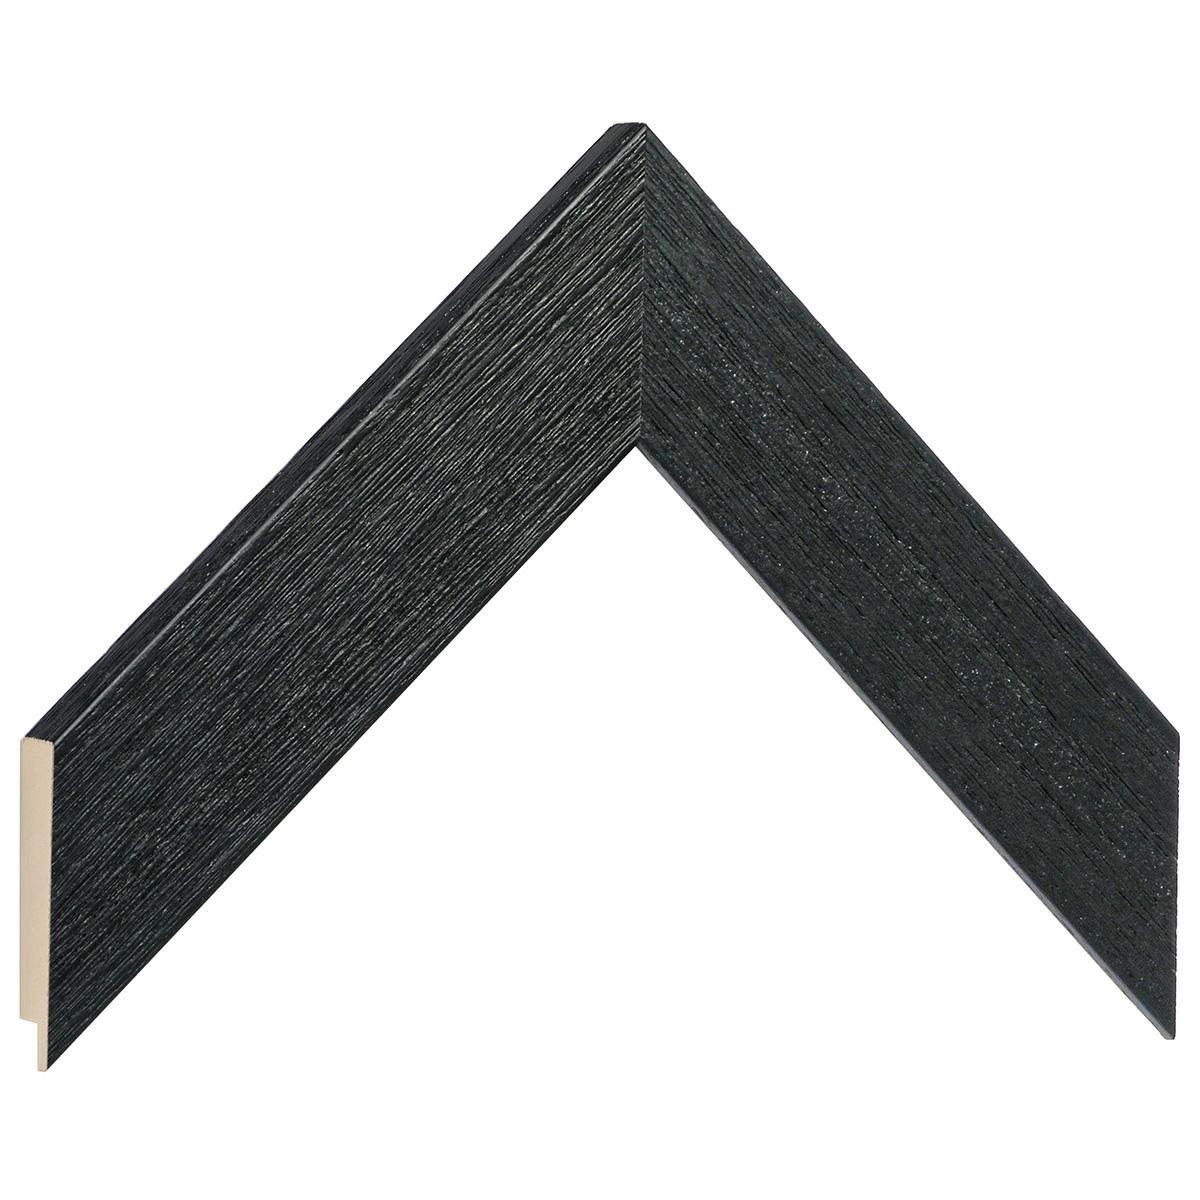 Moulding ayous, width 40mm height 16 - black, open grain